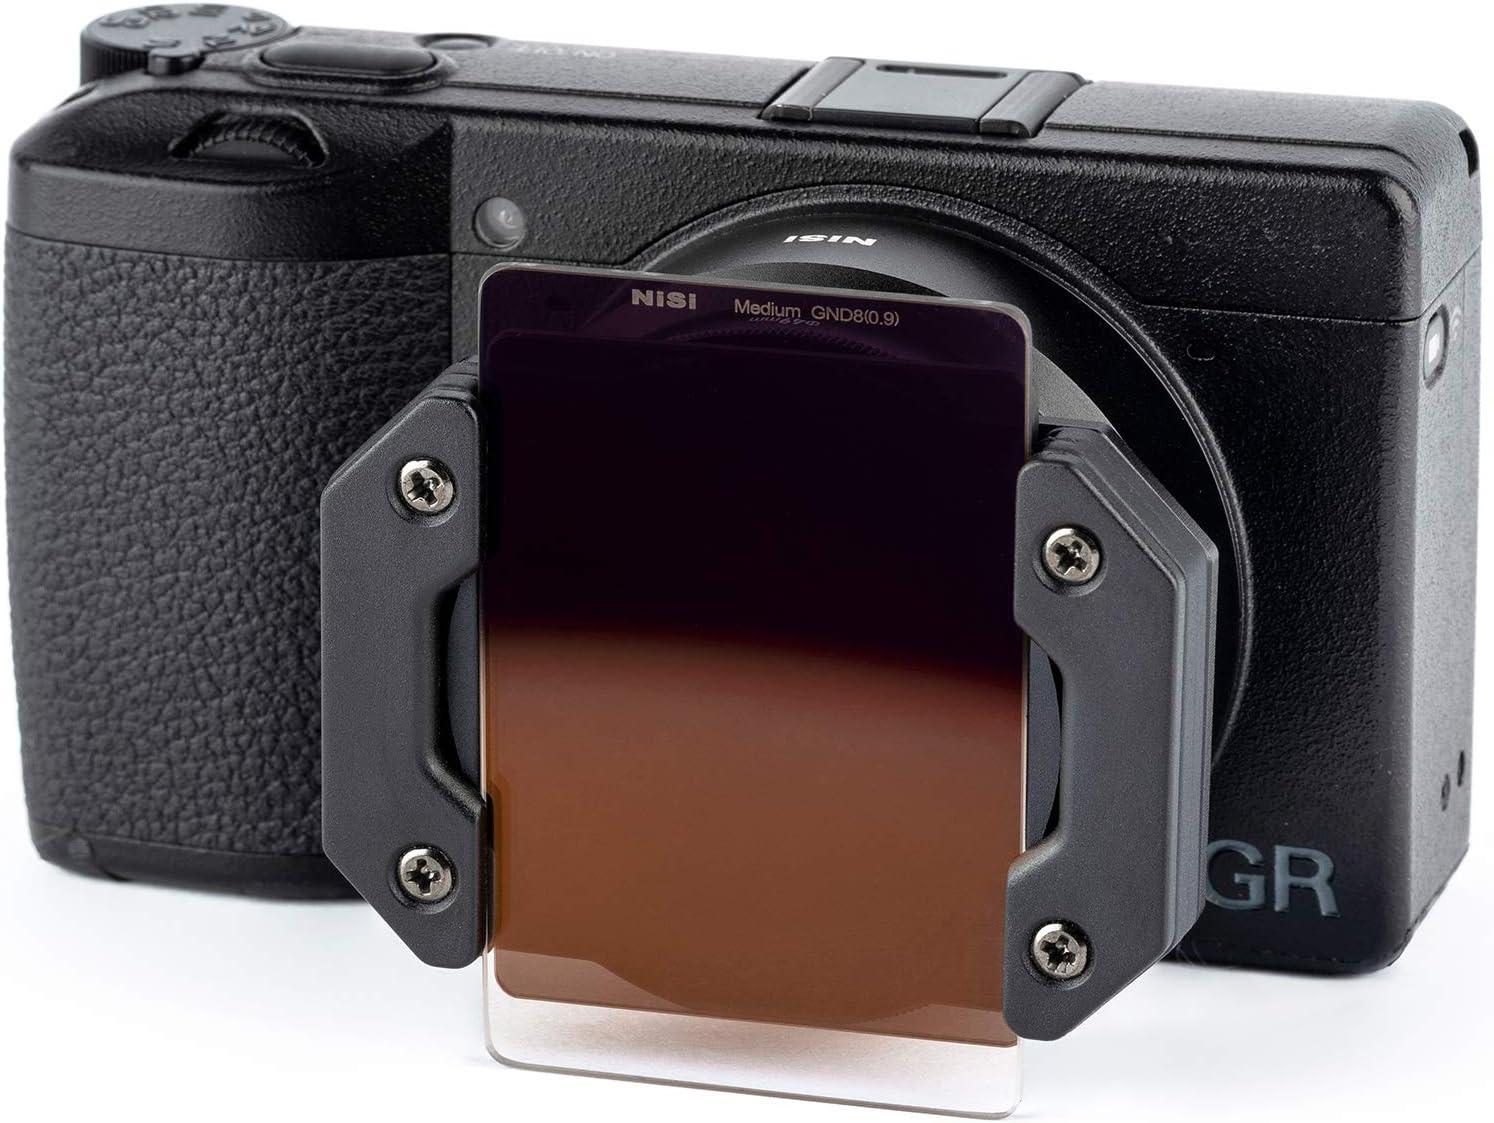 NiSi Filter Kit for Ricoh GRIII Master Kit